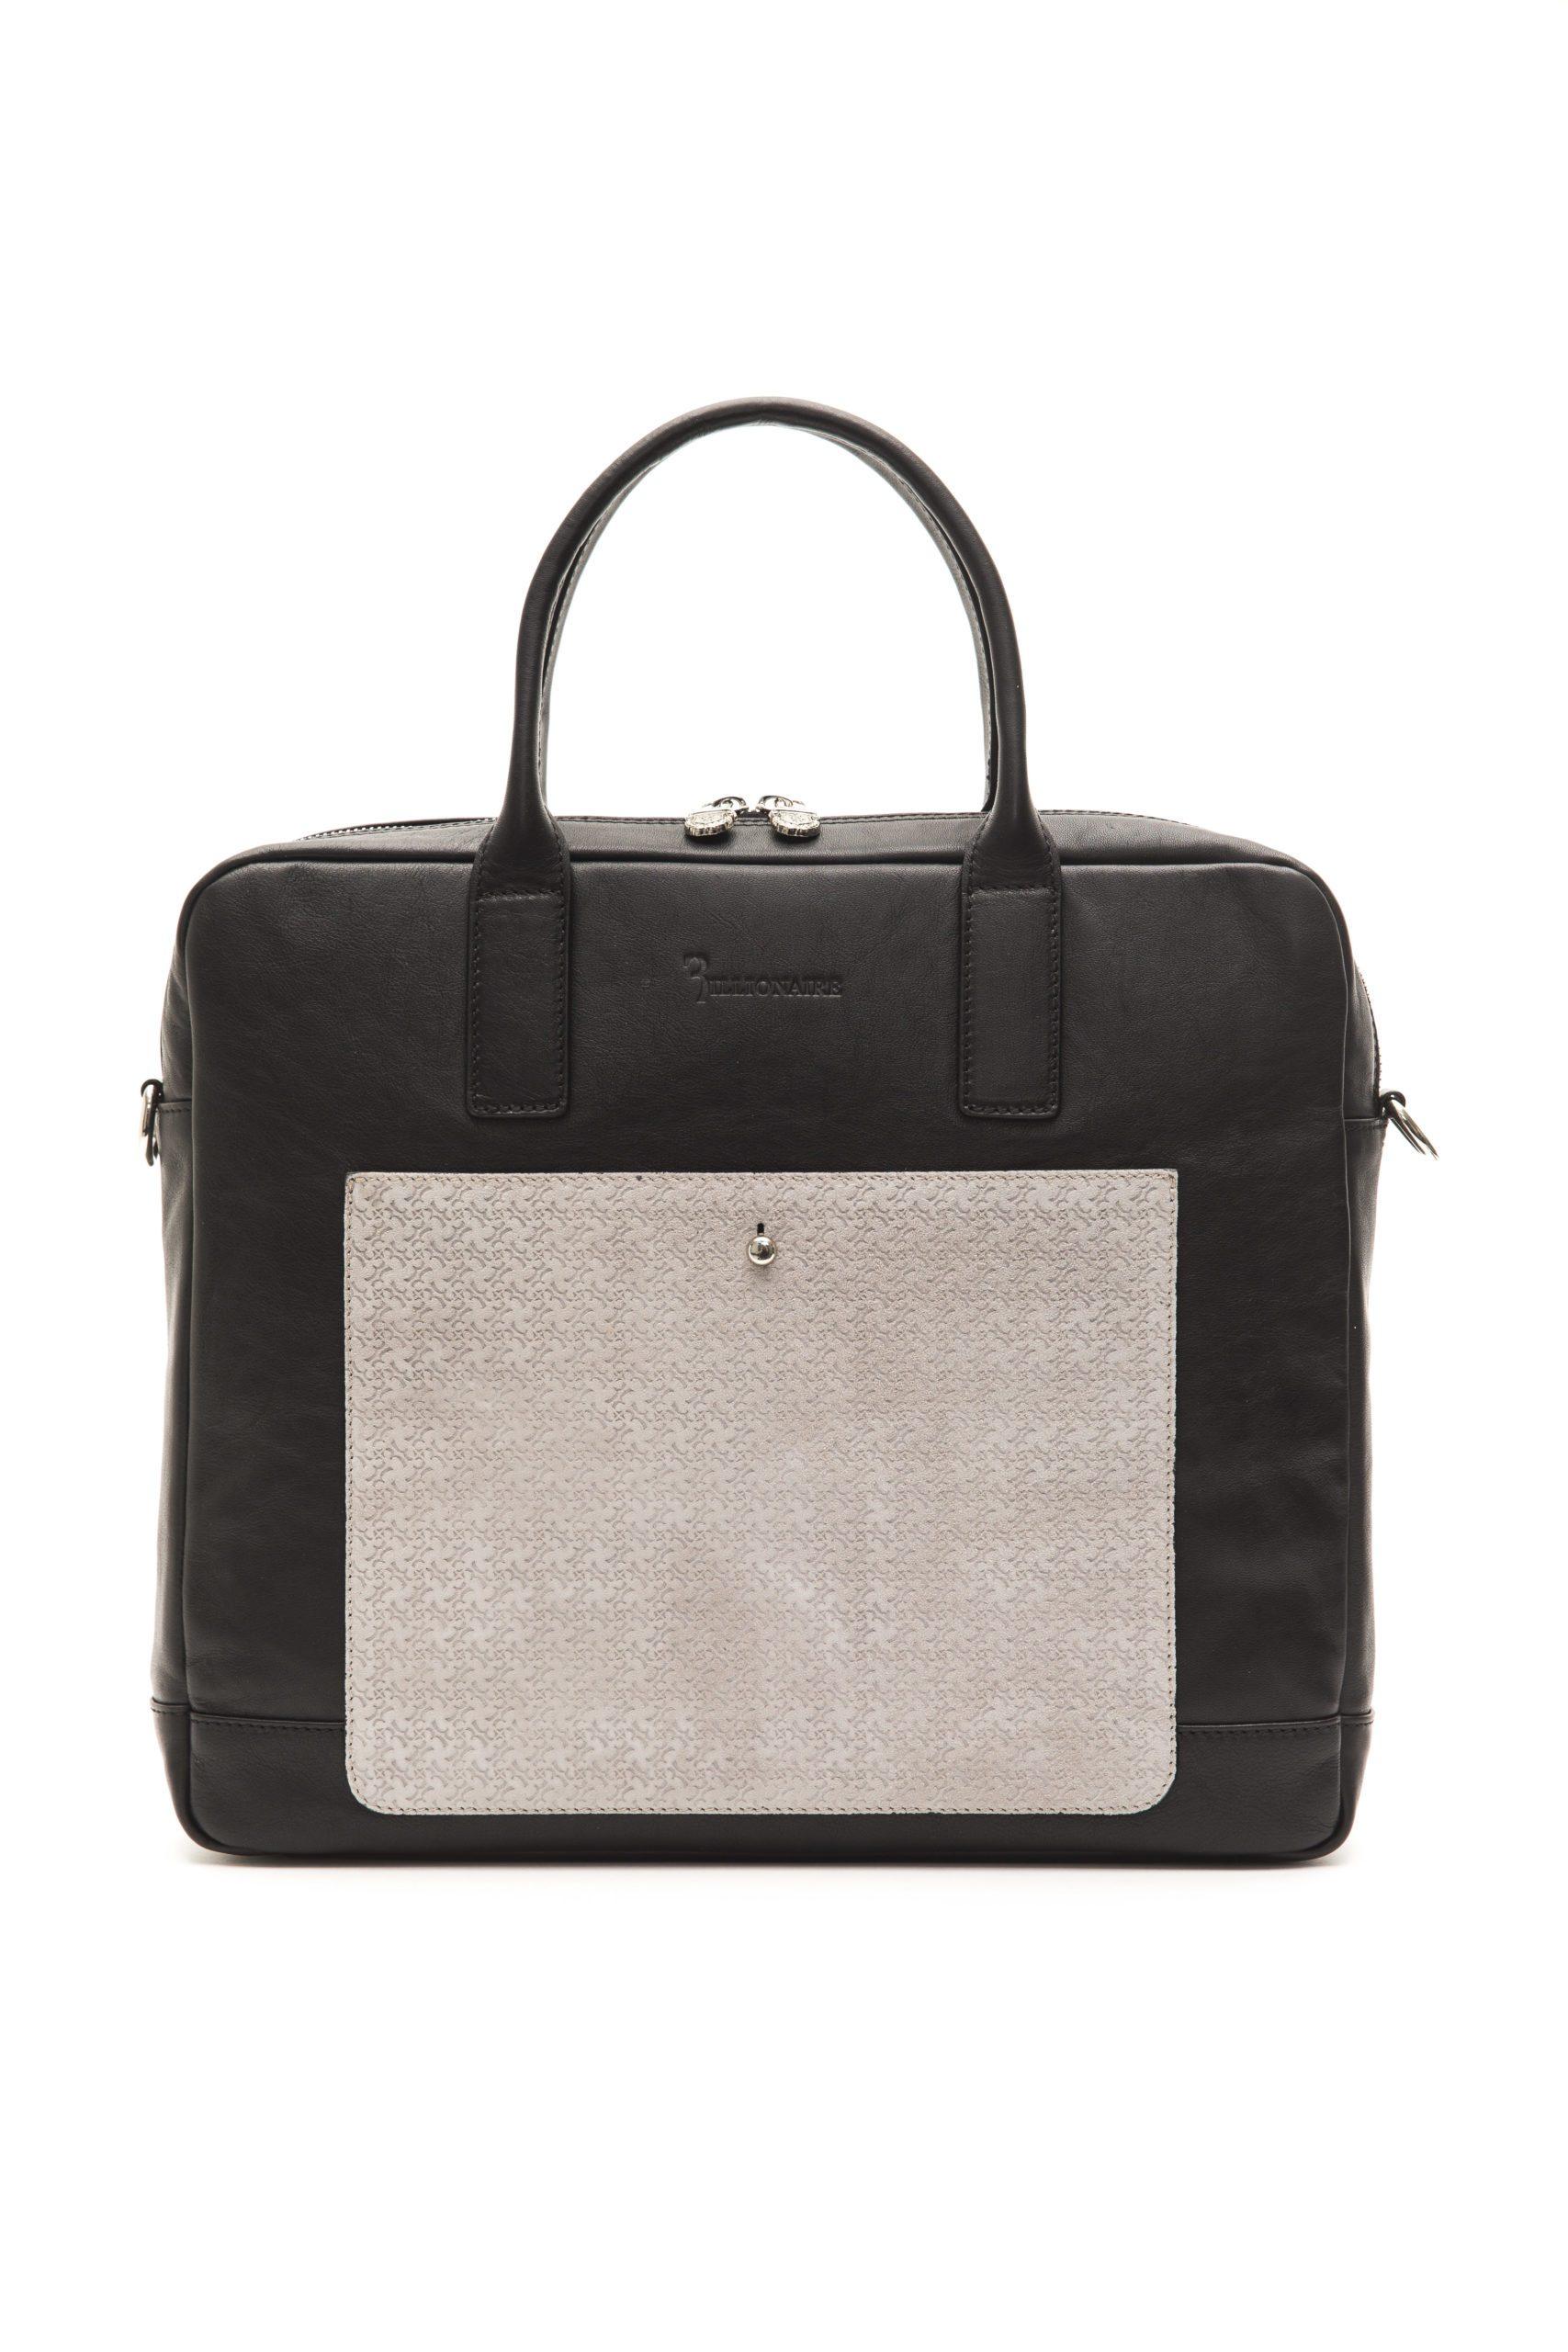 Billionaire Italian Couture Men's Messenger Bag Black BLC5040640-039CV_BlackGrey